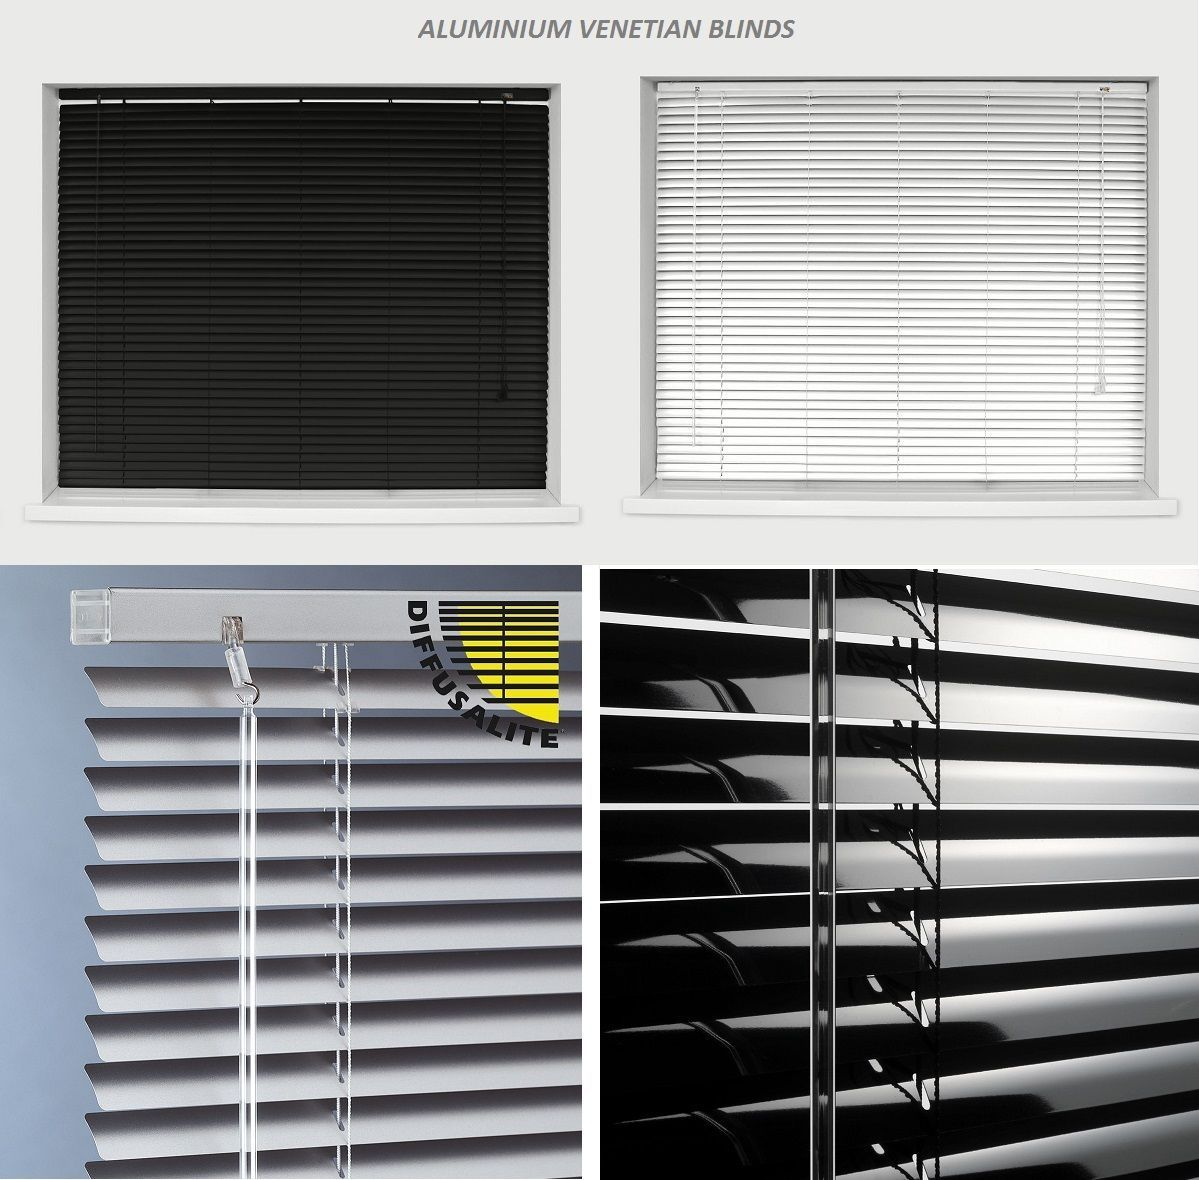 Aluminum slats for 25mm venetian shutters buy aluminium - Aluminium Metal Venetian Blinds Trimable Easy Fit 25mm Slat Home Office All Size